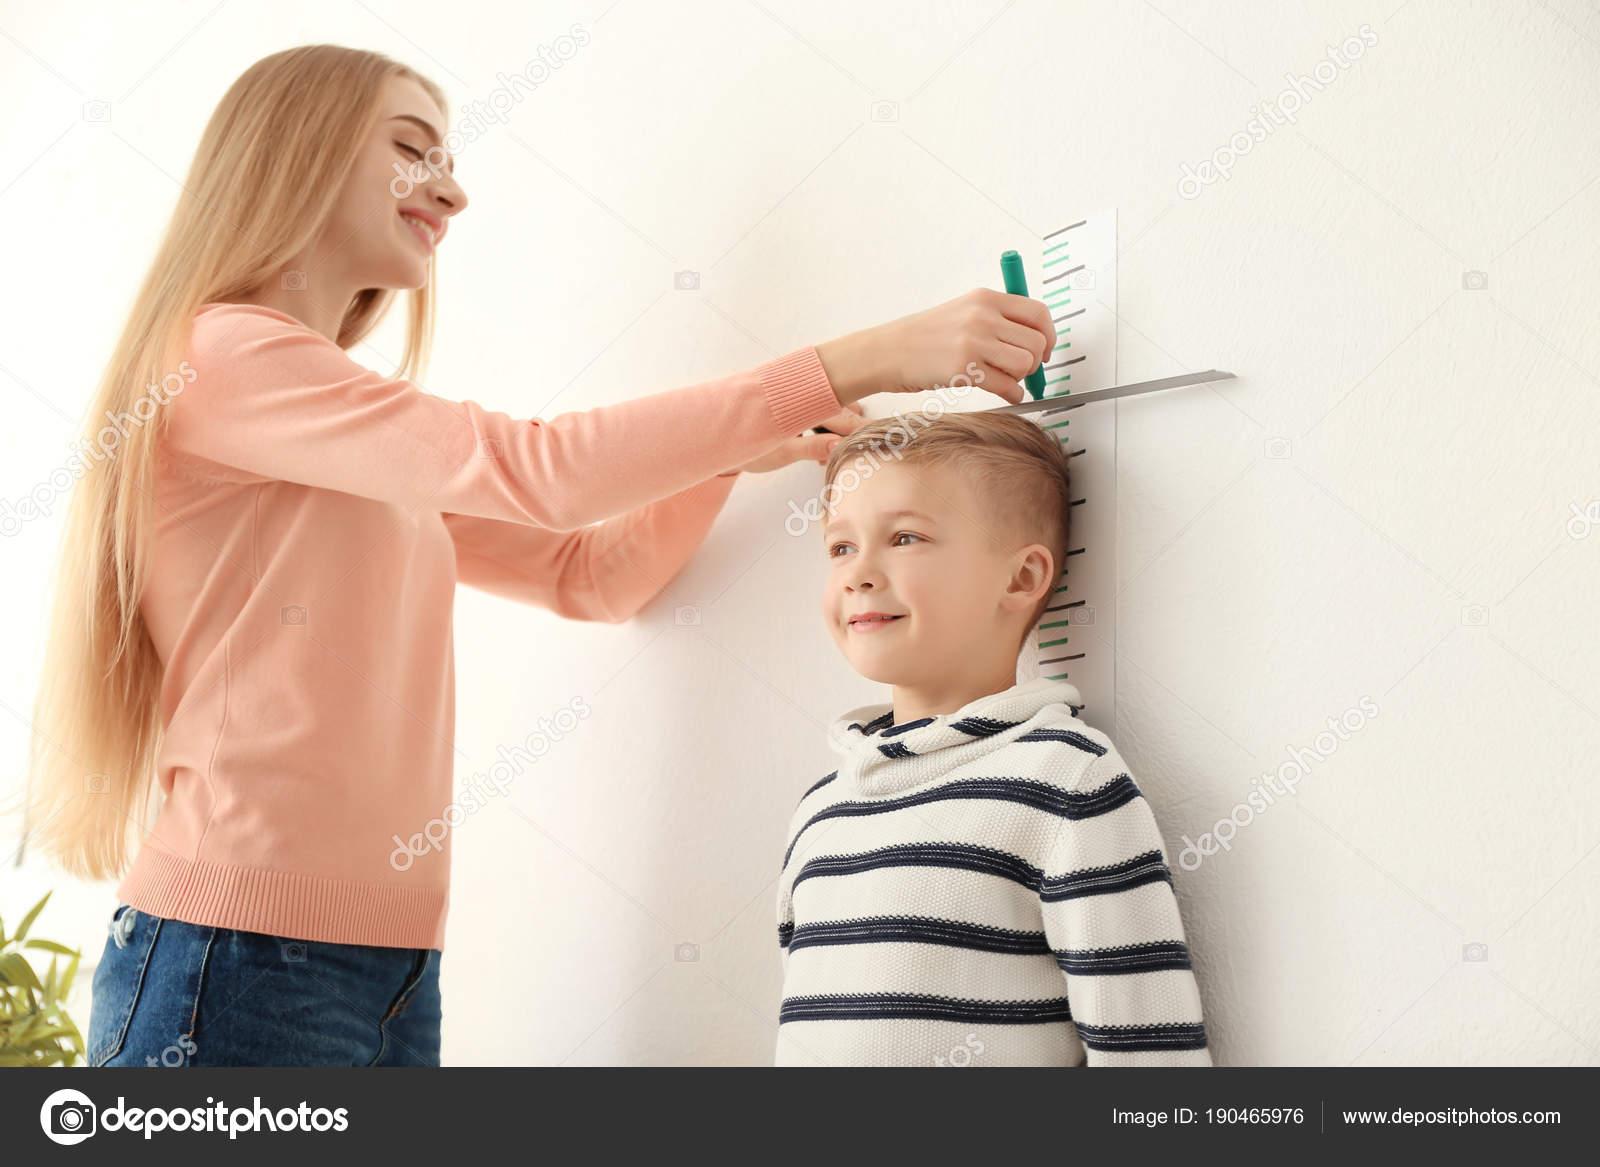 Woman Measuring Height Of Little Boy